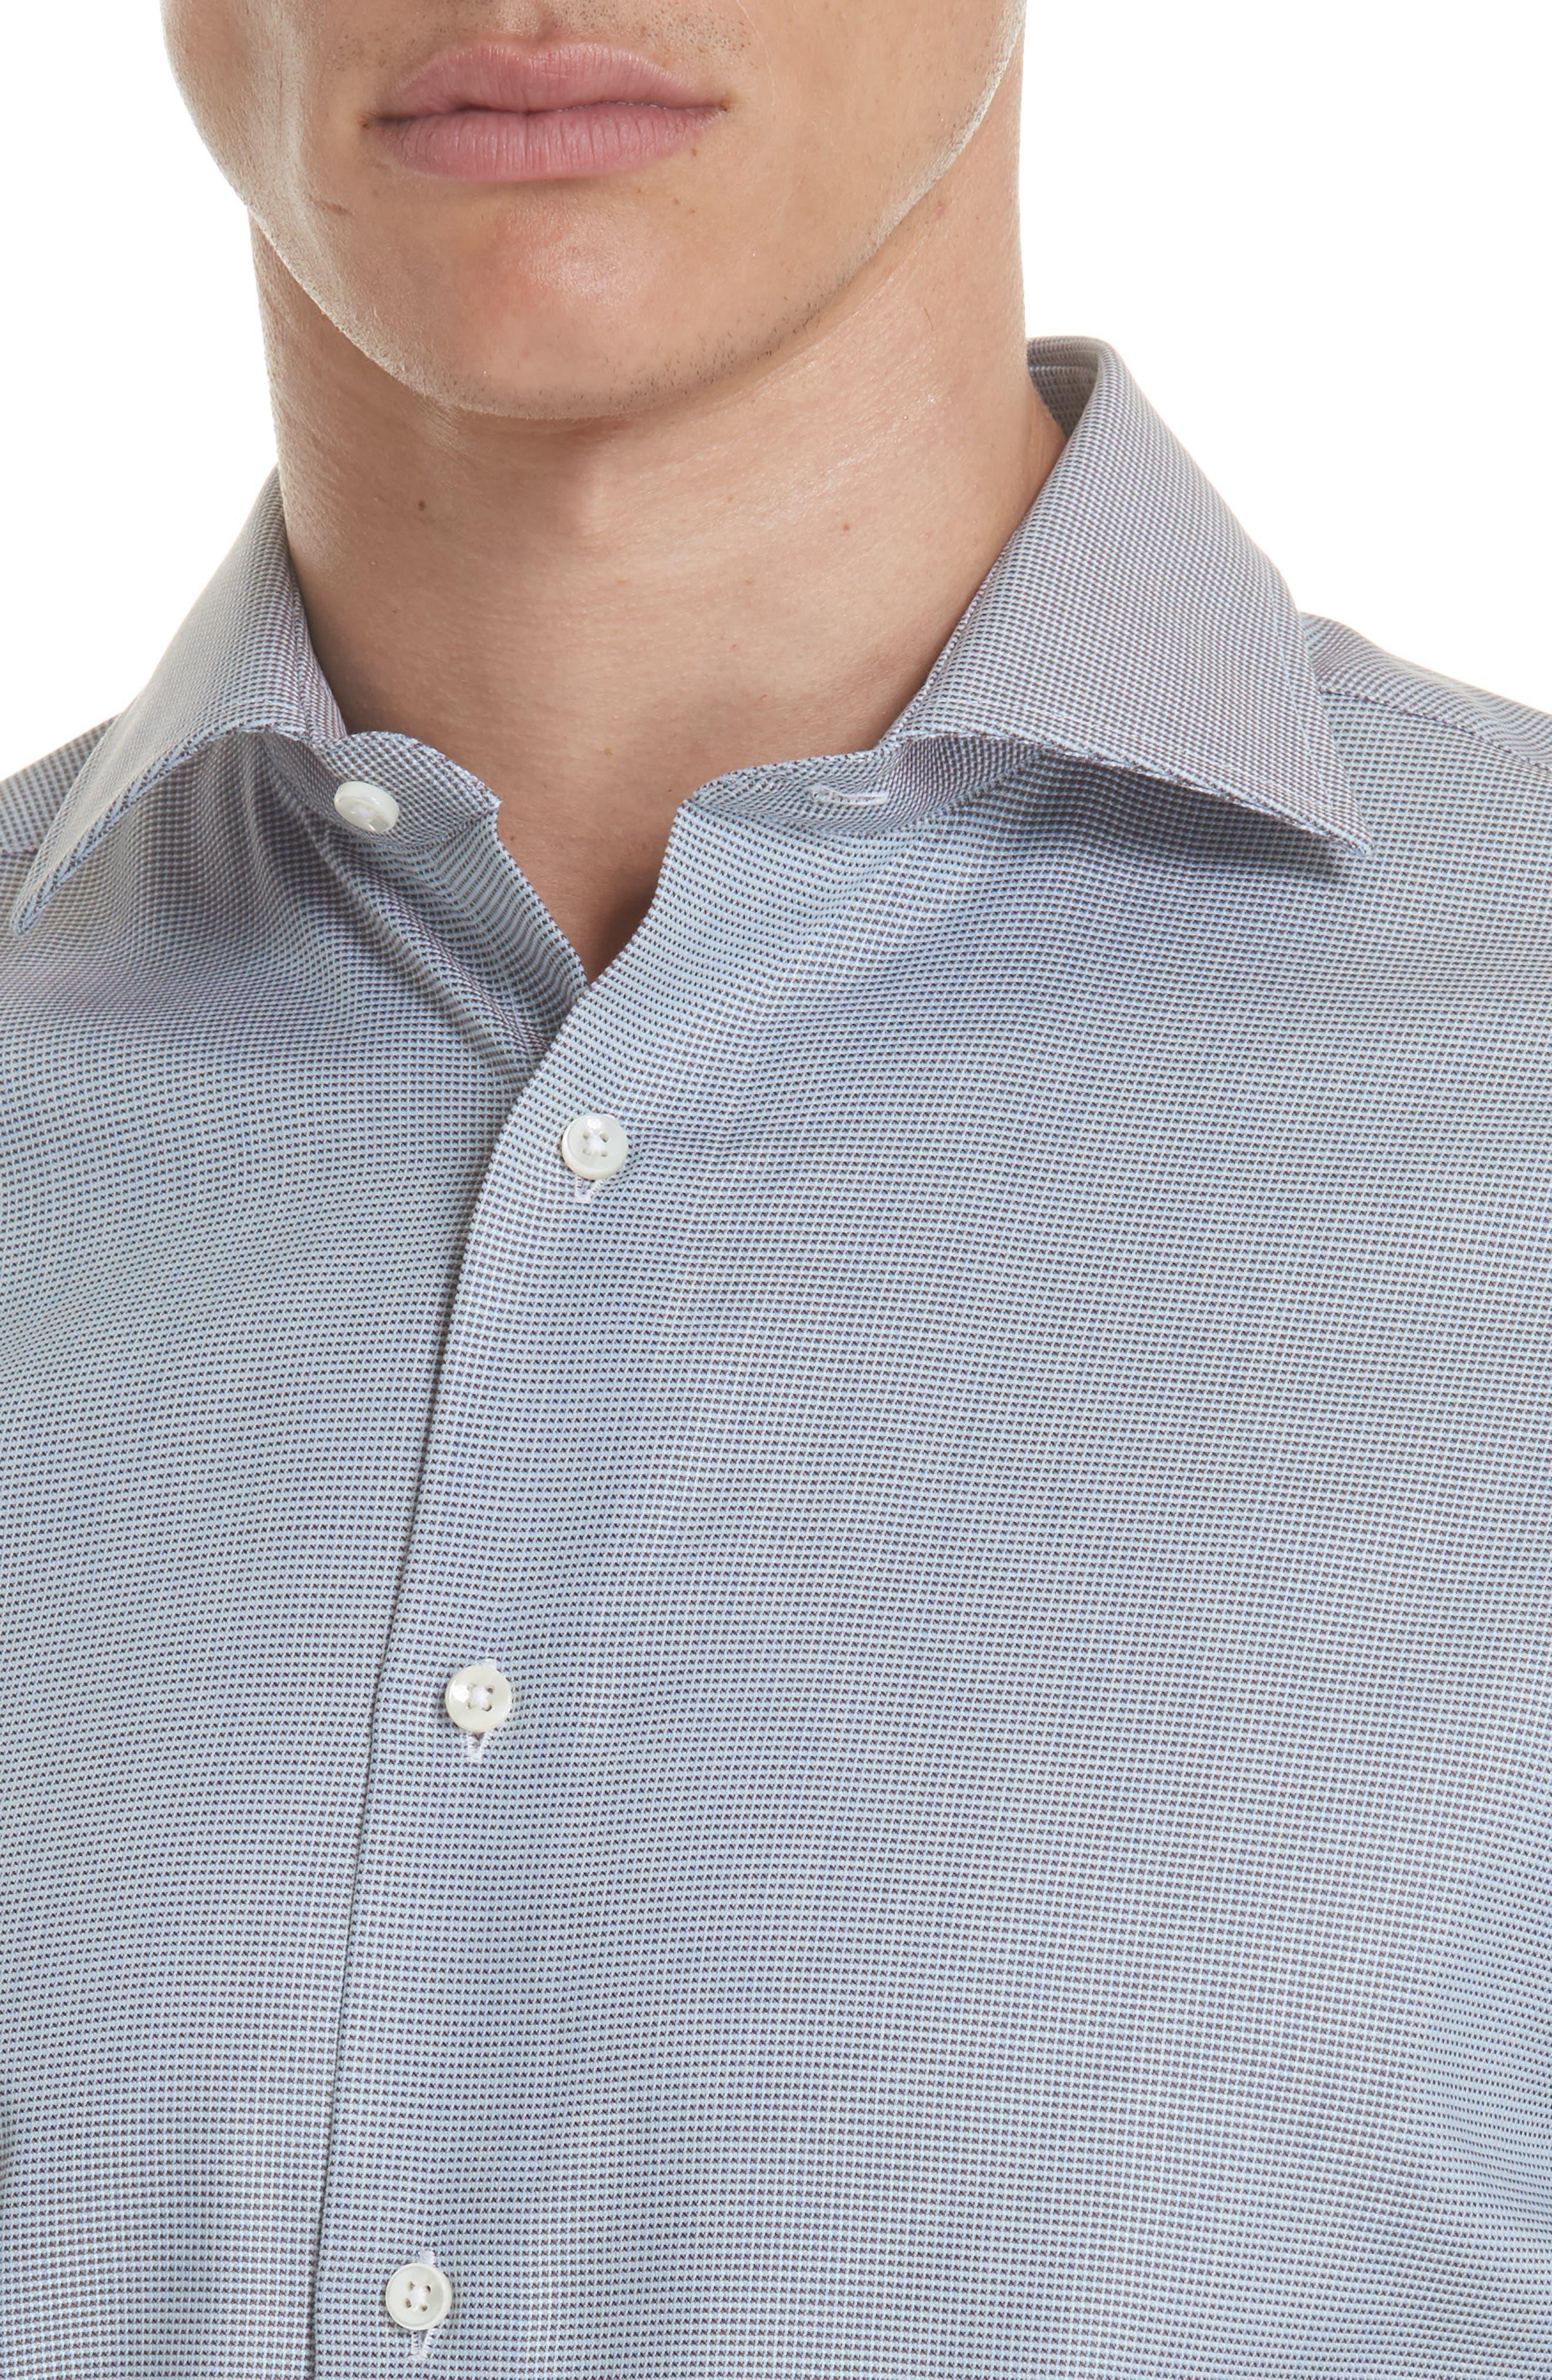 Regular Fit Solid Dress Shirt,                             Alternate thumbnail 2, color,                             200